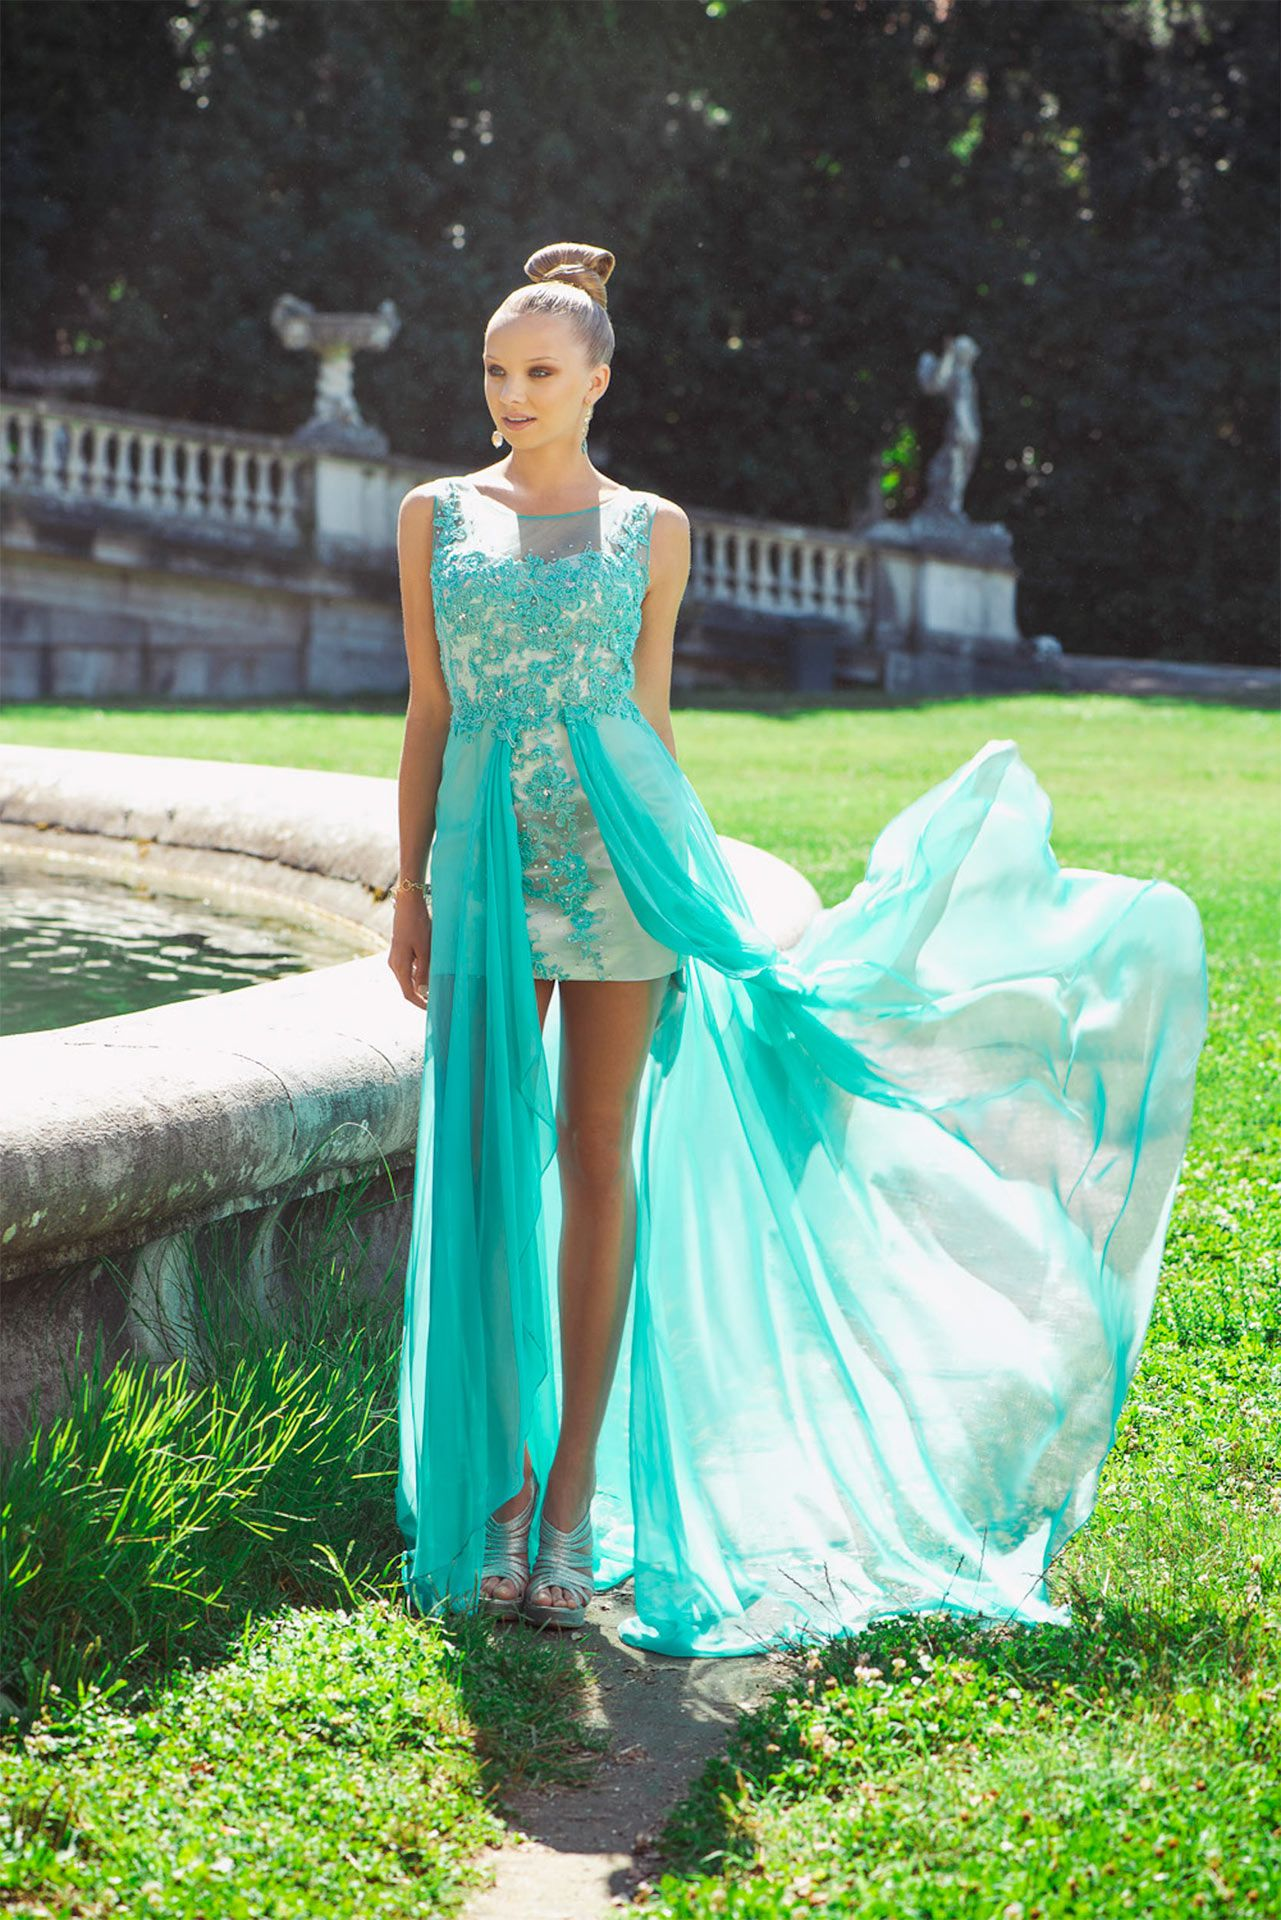 Vestiti Cerimonia Color Tiffany.Abiti Cerimonia Abito Sera Cocktaildress Dress Ceremony